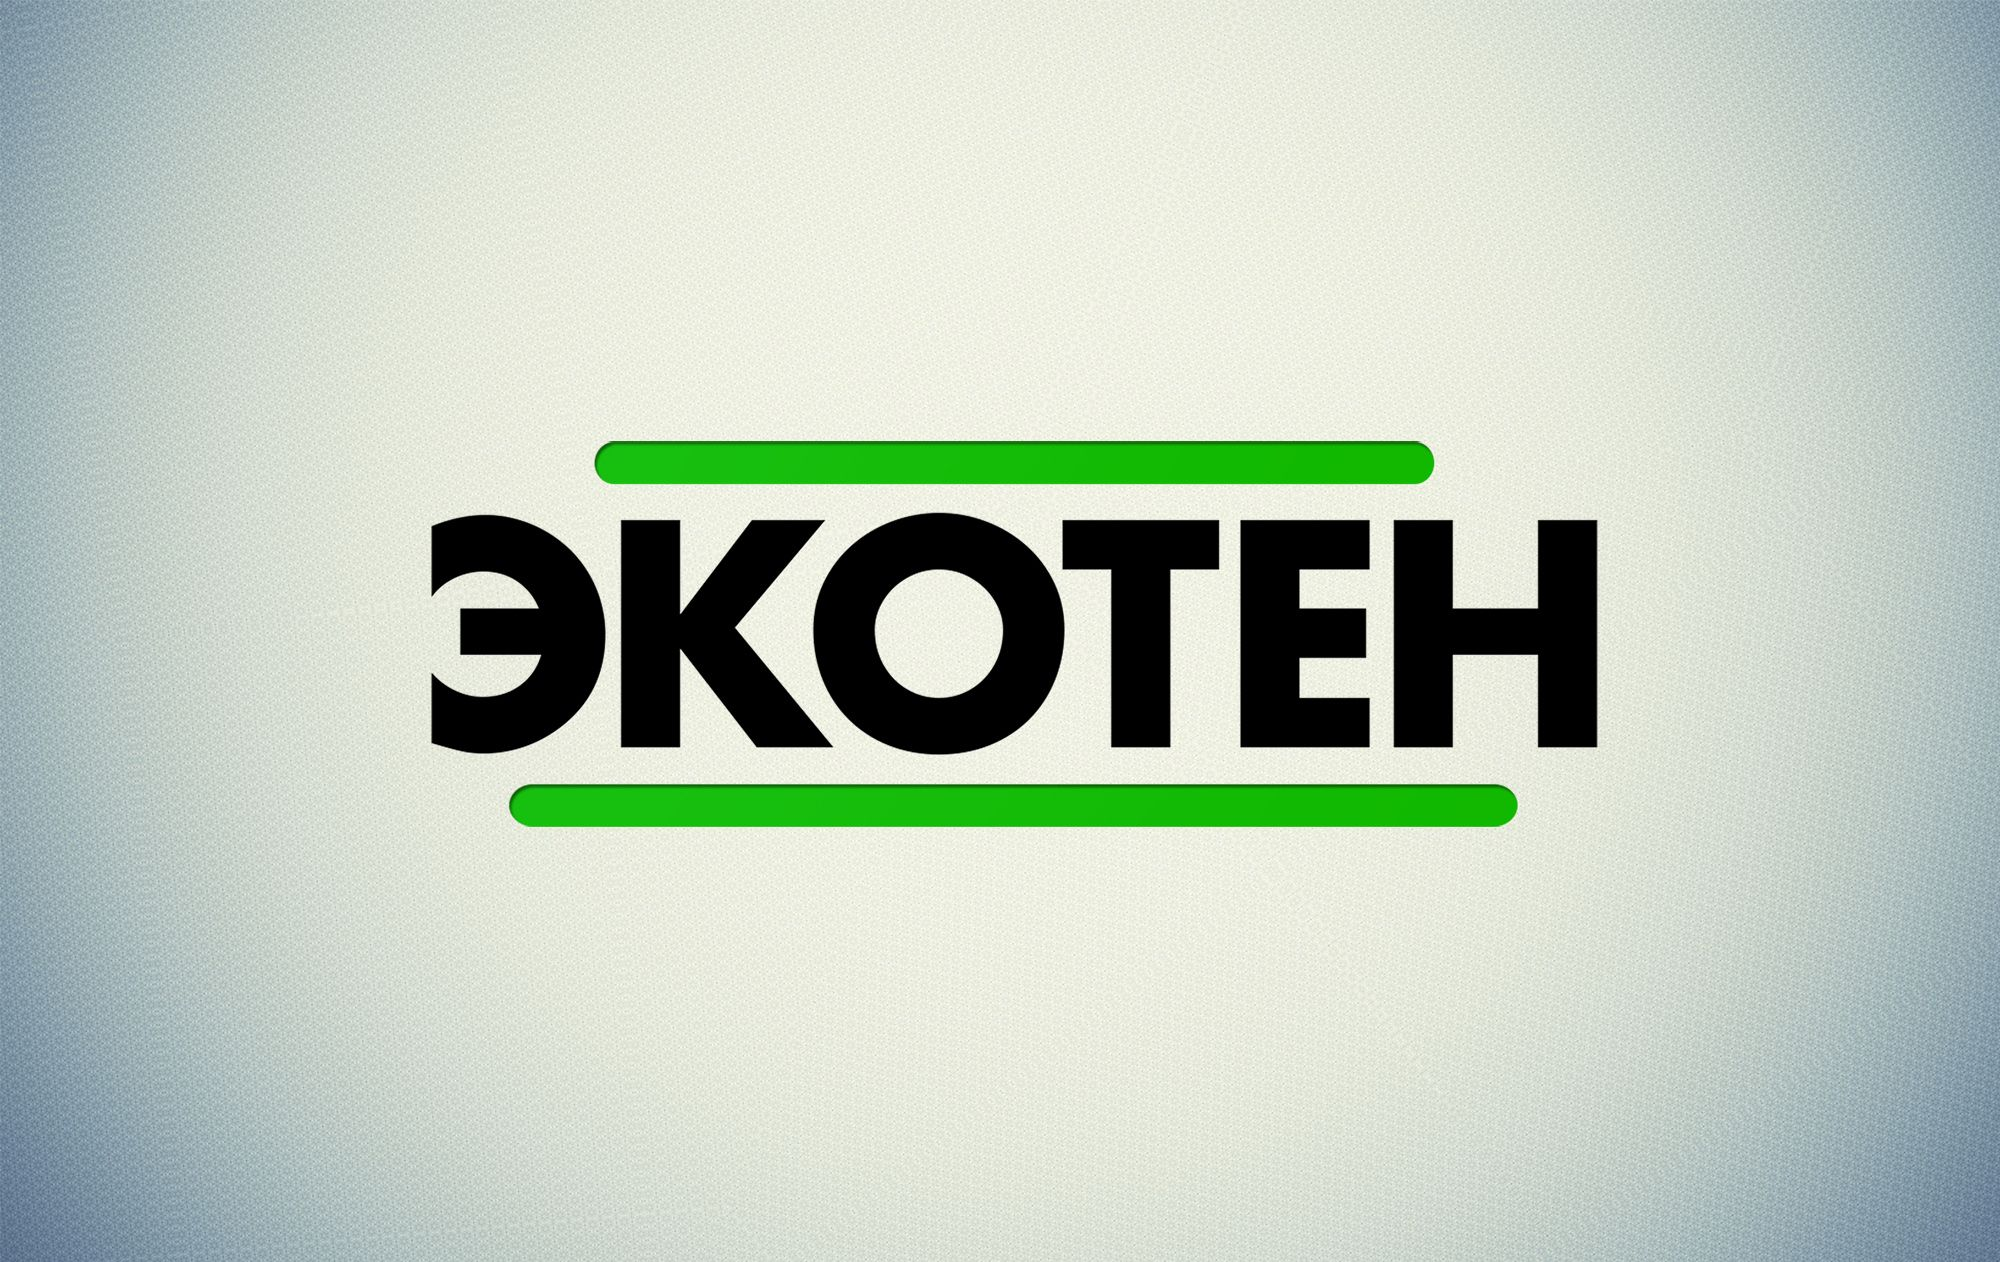 Логотип для научно - технического концерна - дизайнер MZFKLoose94